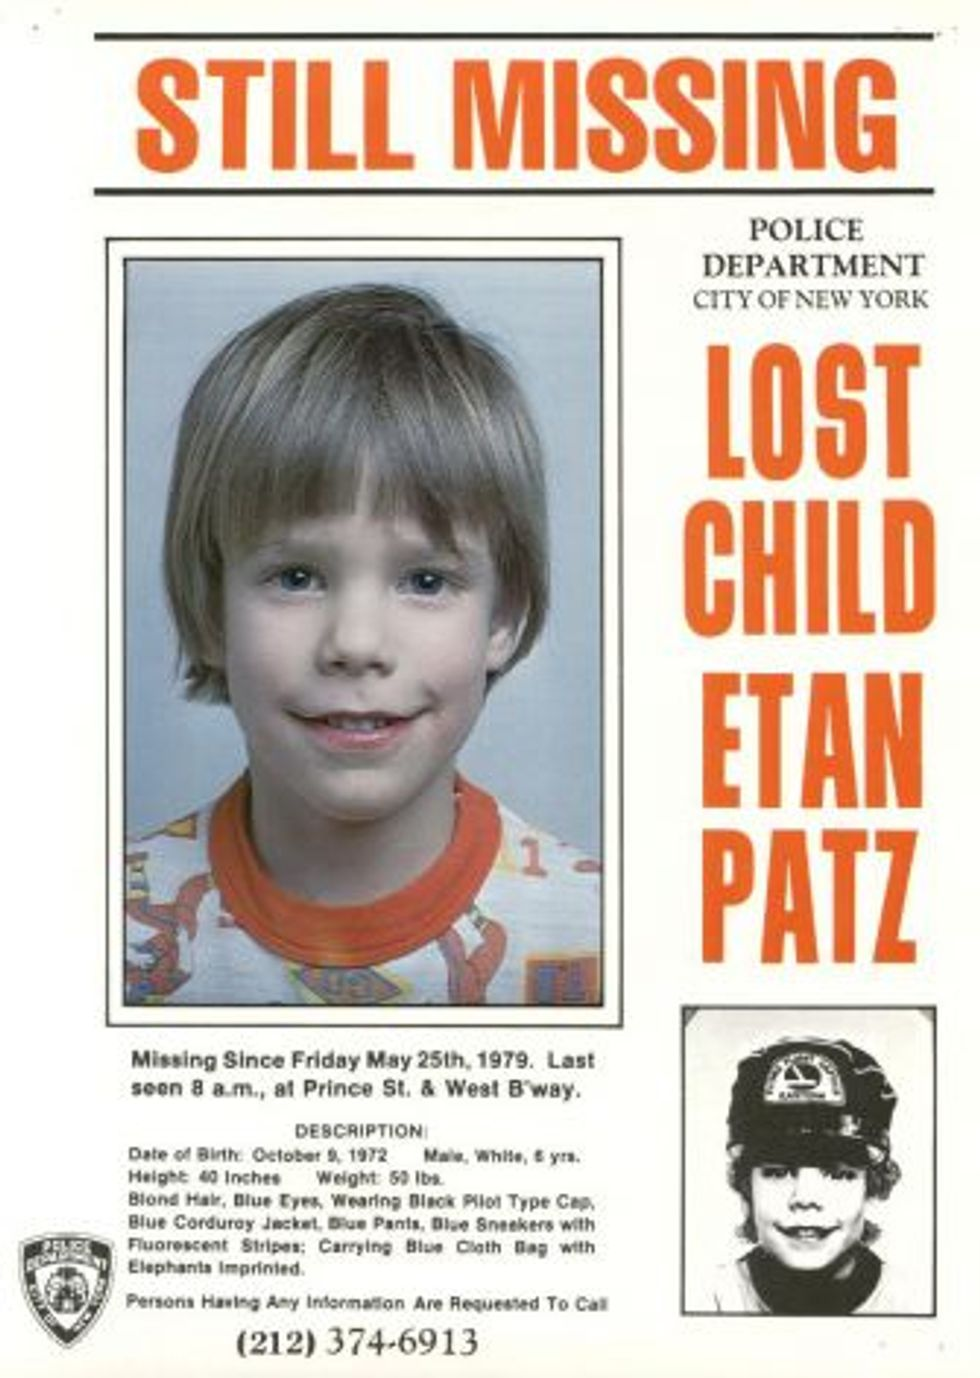 Remembering Etan Patz, Still Missing 33 Years Later